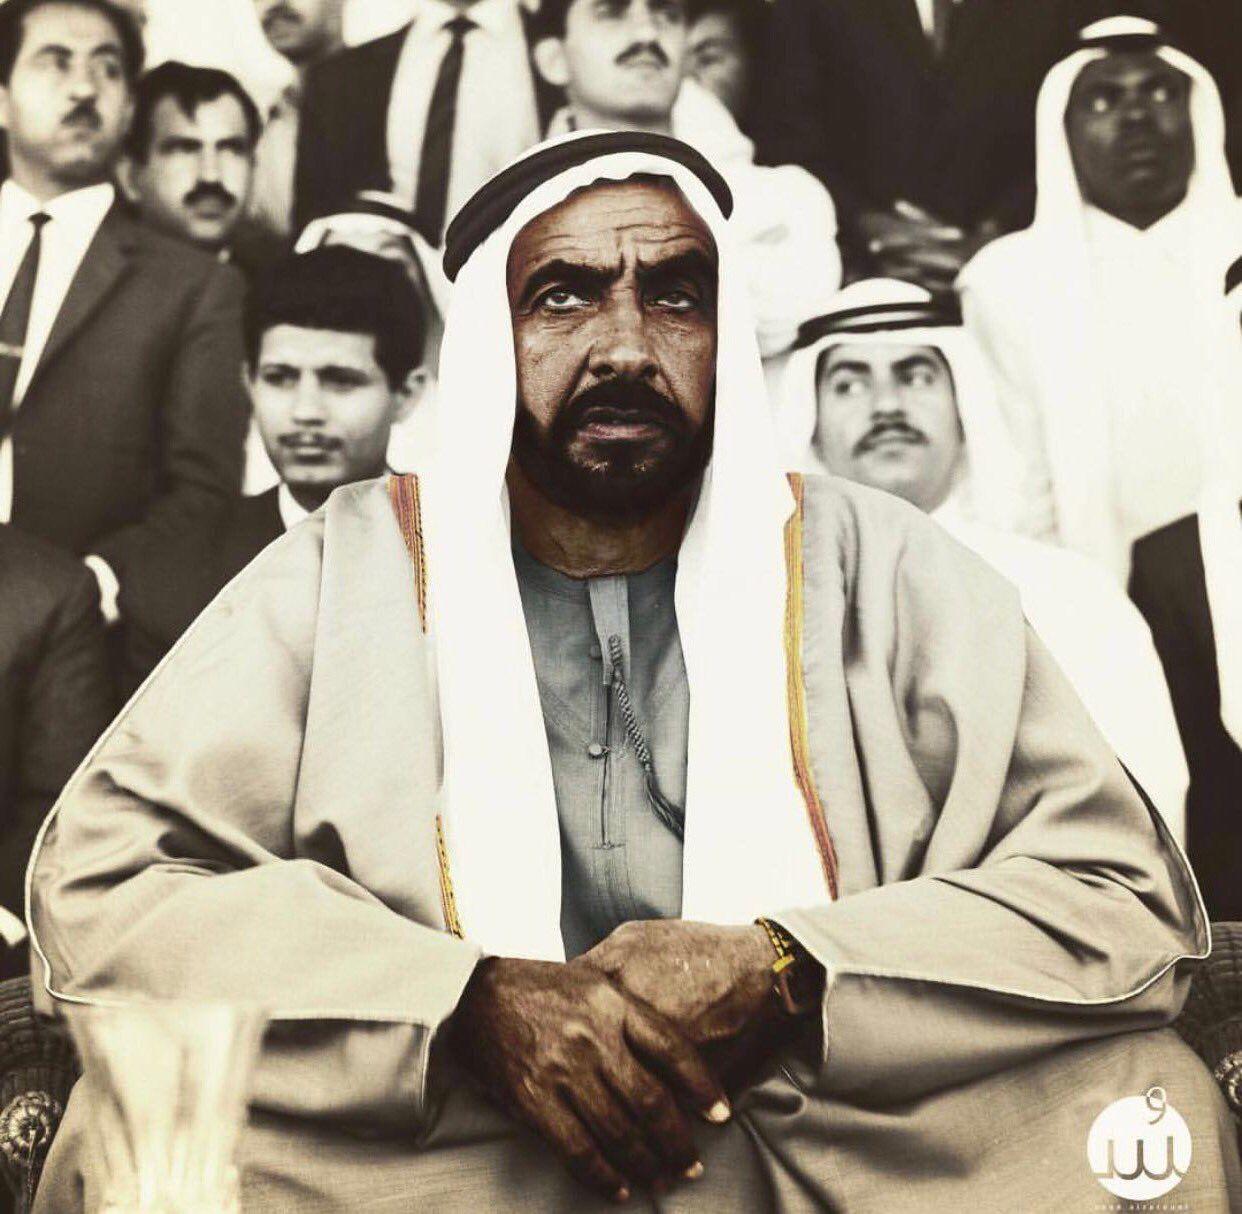 United Arab Emirates, Uae, Presidents, Crown, Prince, Corona, Crowns